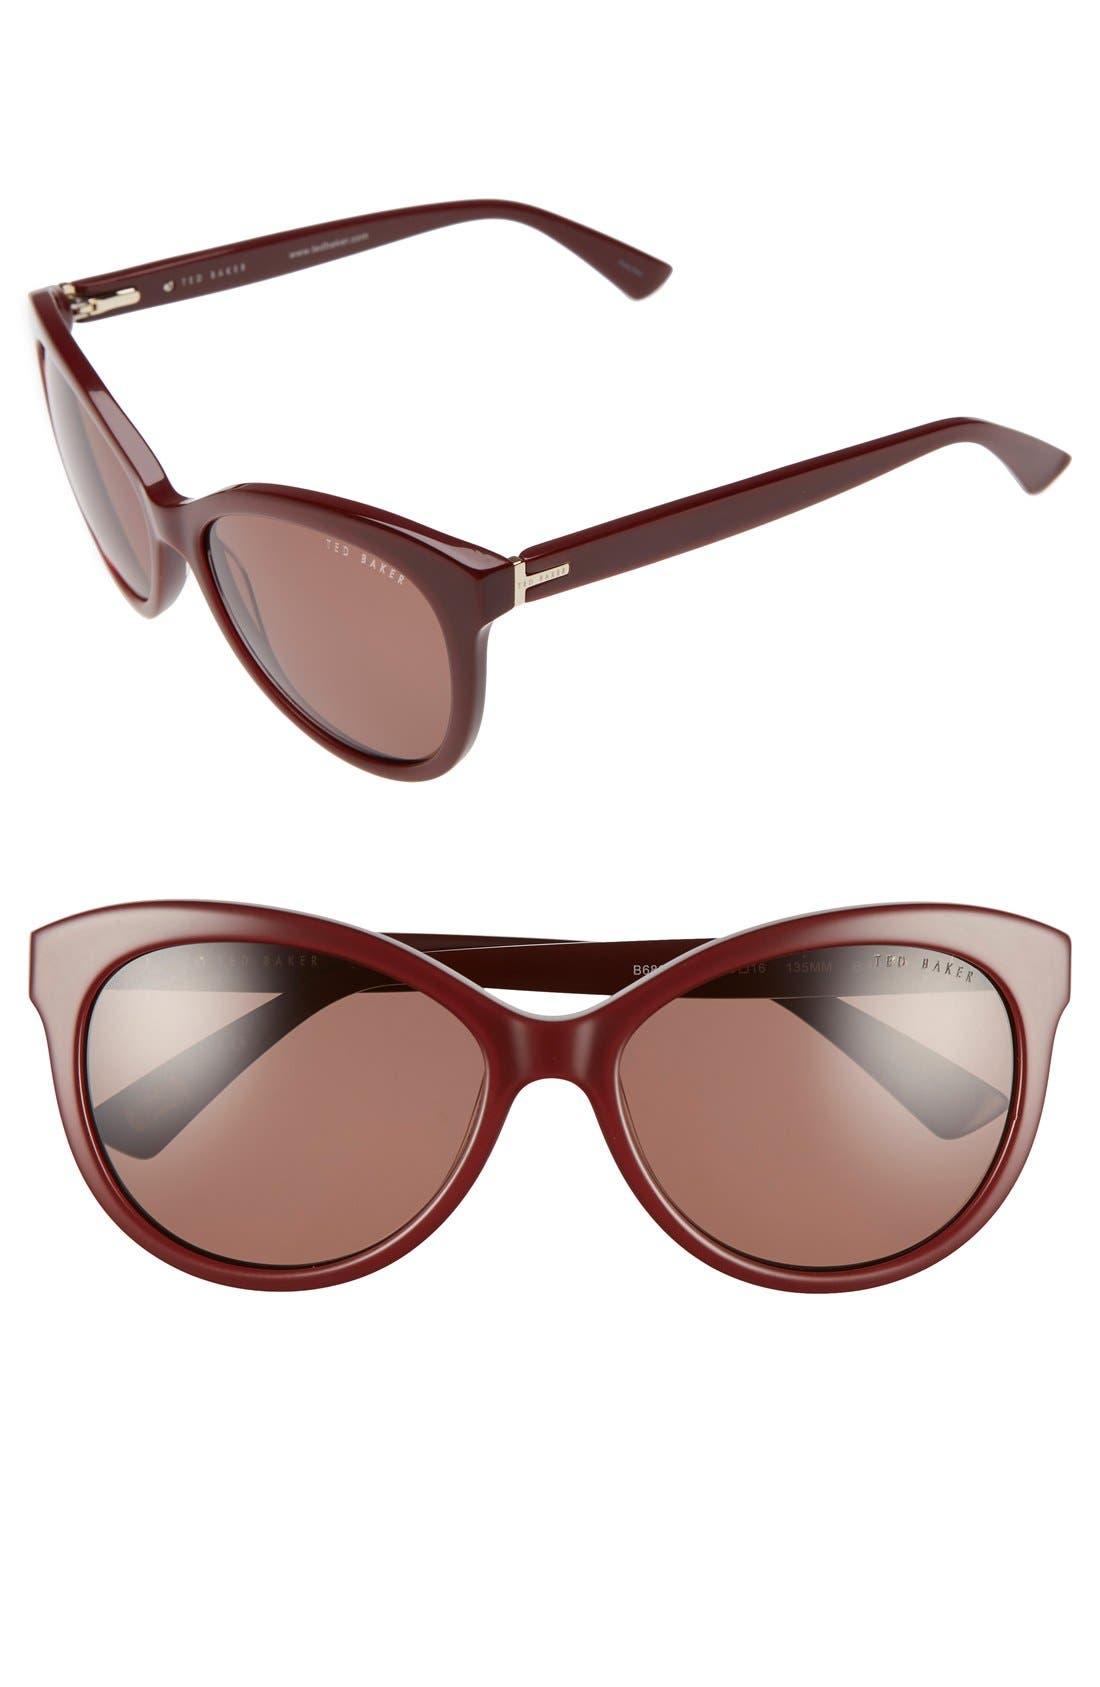 Main Image - Ted Baker London 56mm Cat Eye Sunglasses